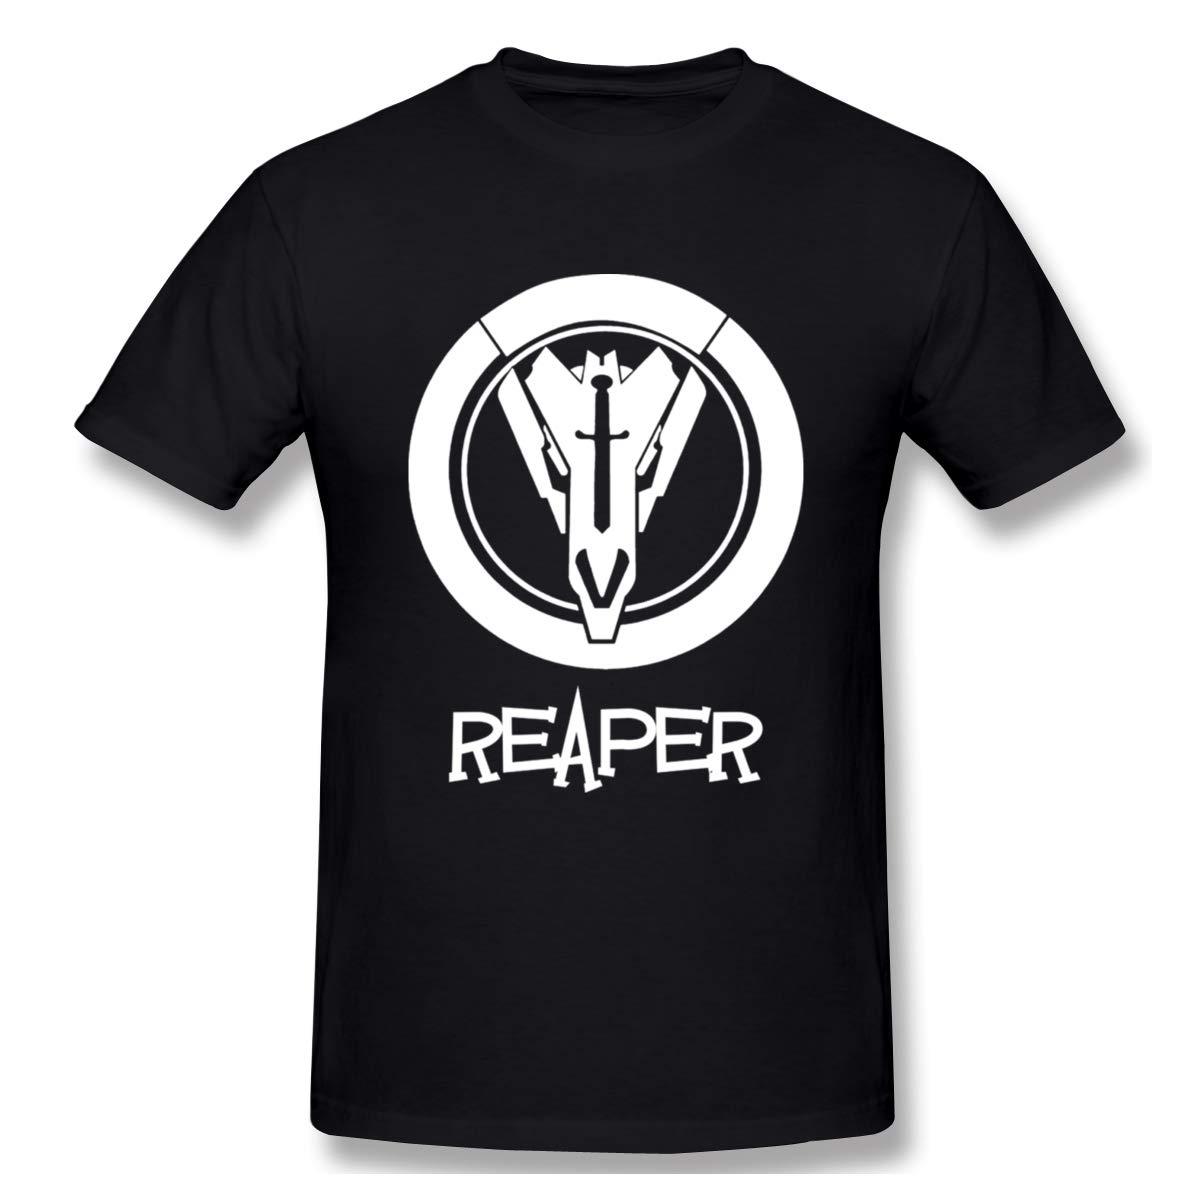 S Overwatch Reaper Short Sleeve Shirt Black